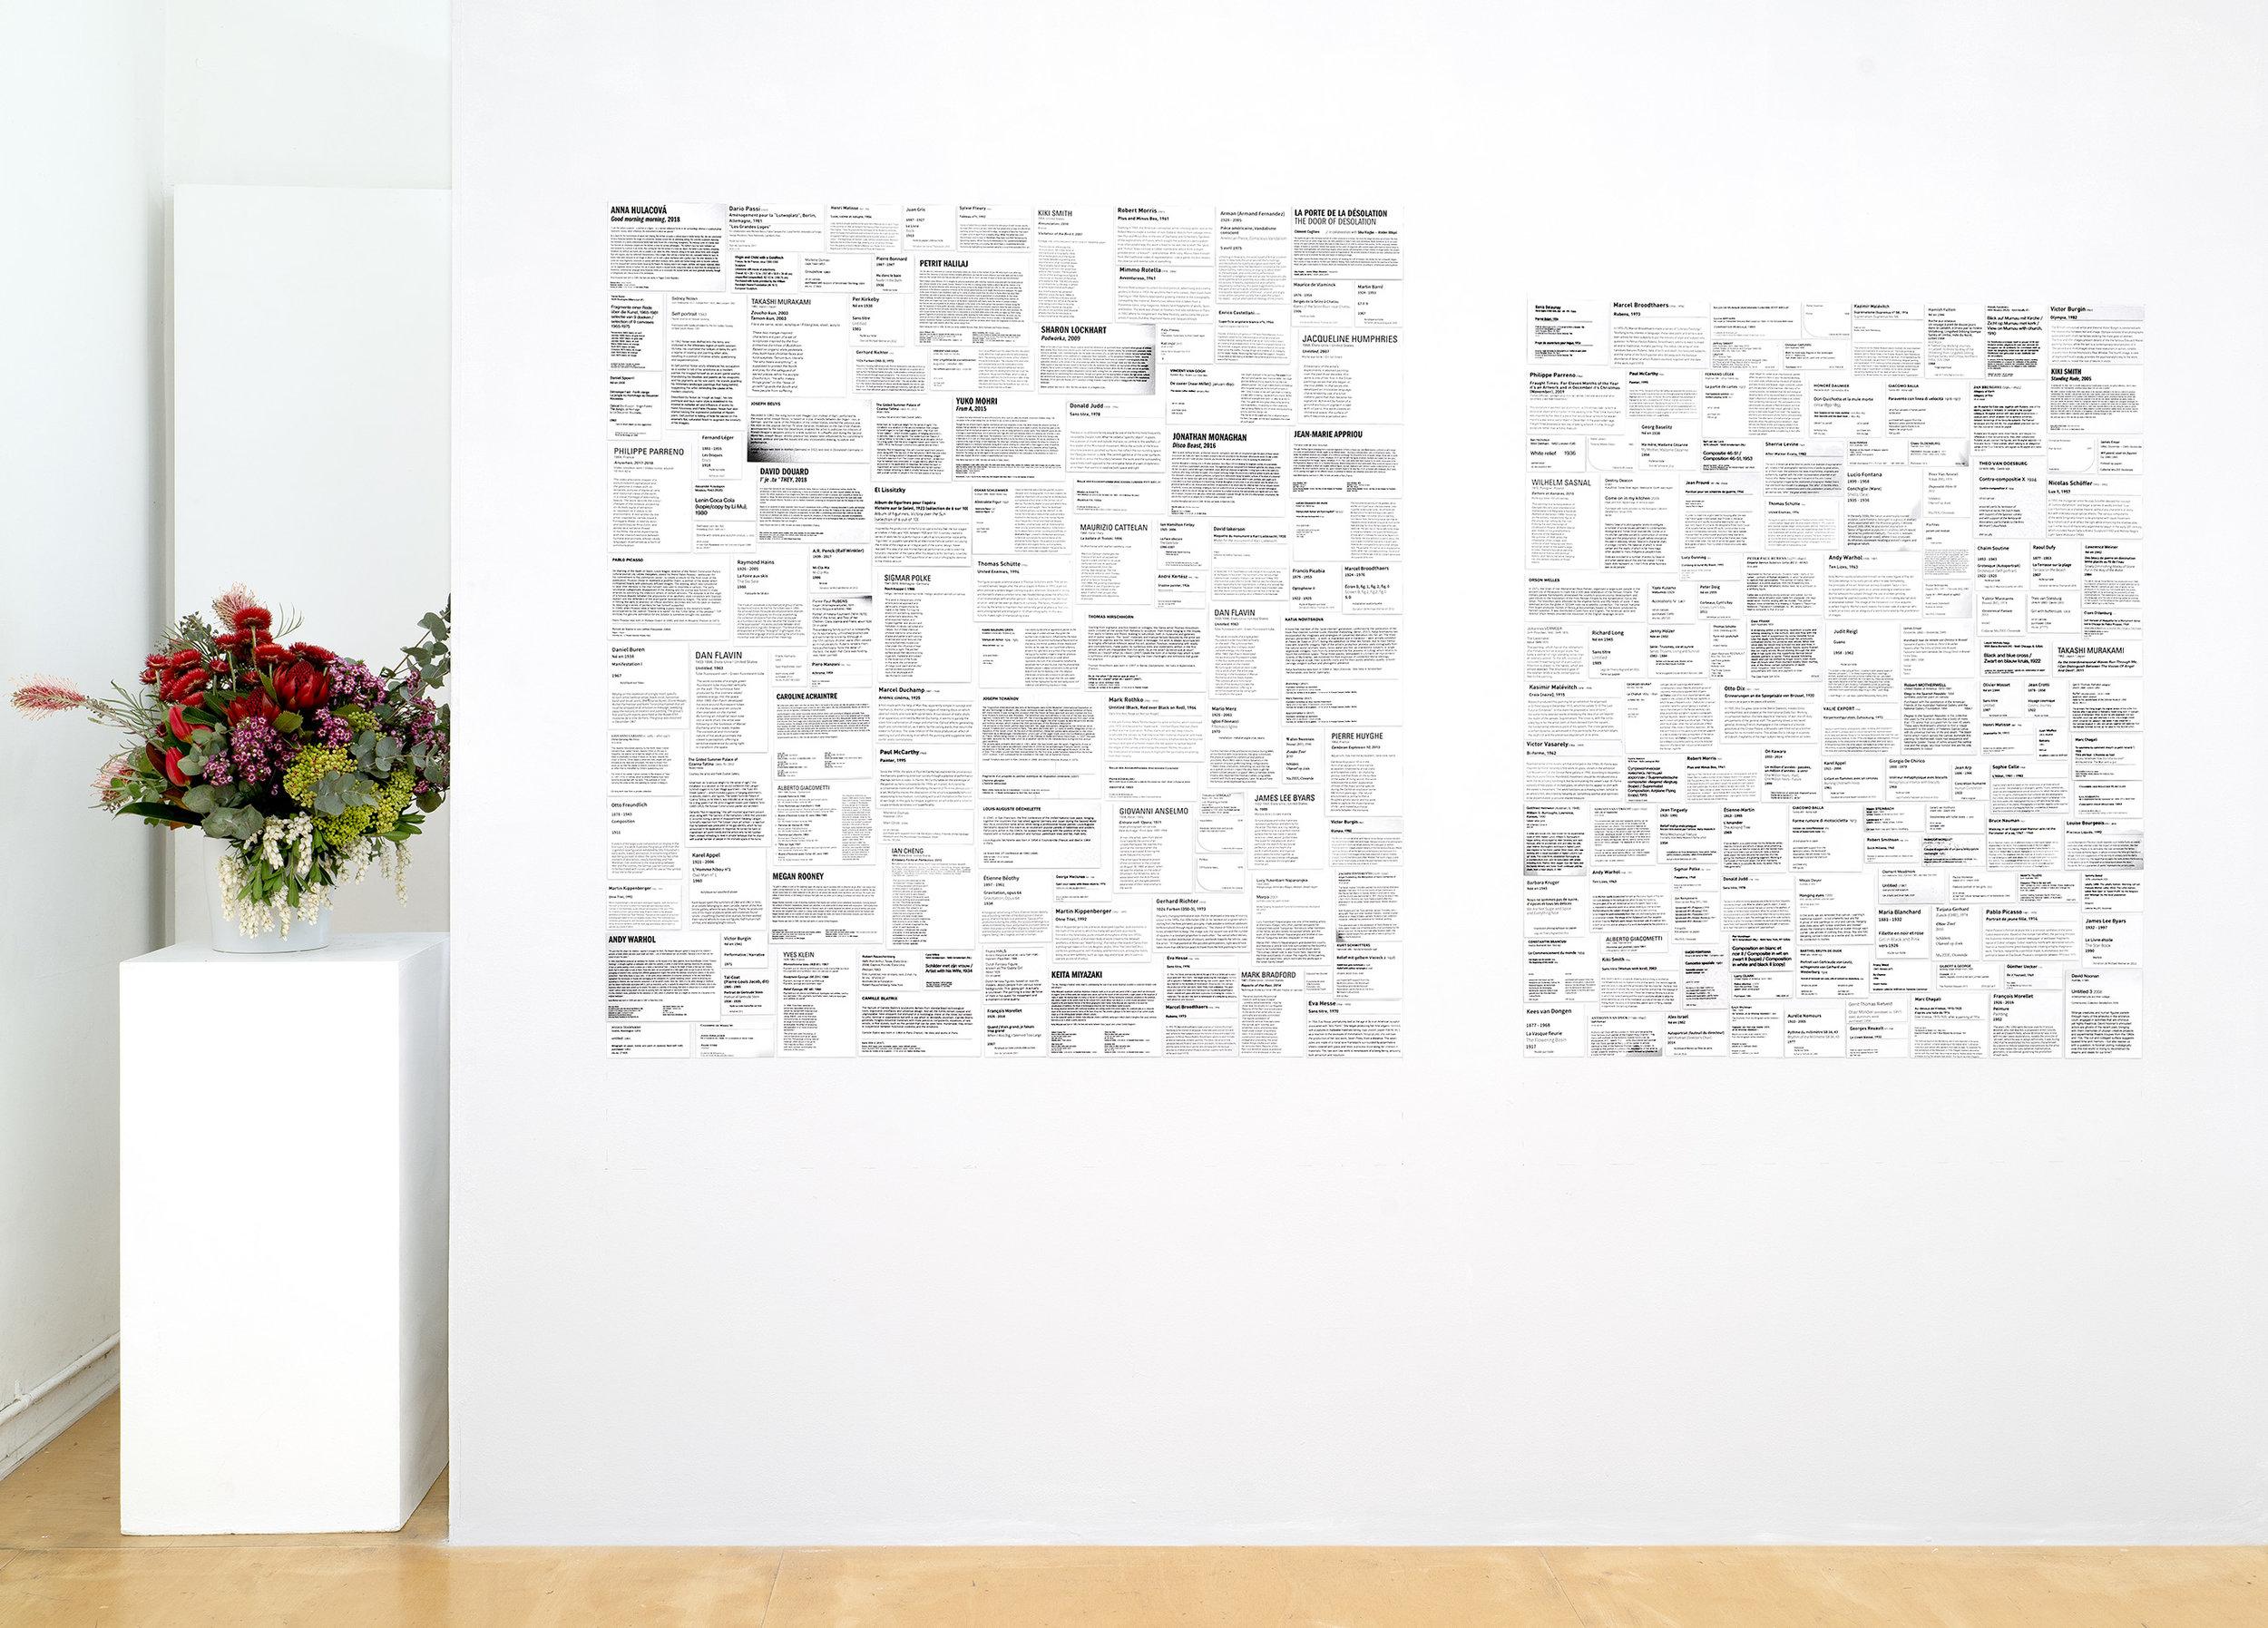 1. Geoff Kleem -Install with flowers 2018.jpg